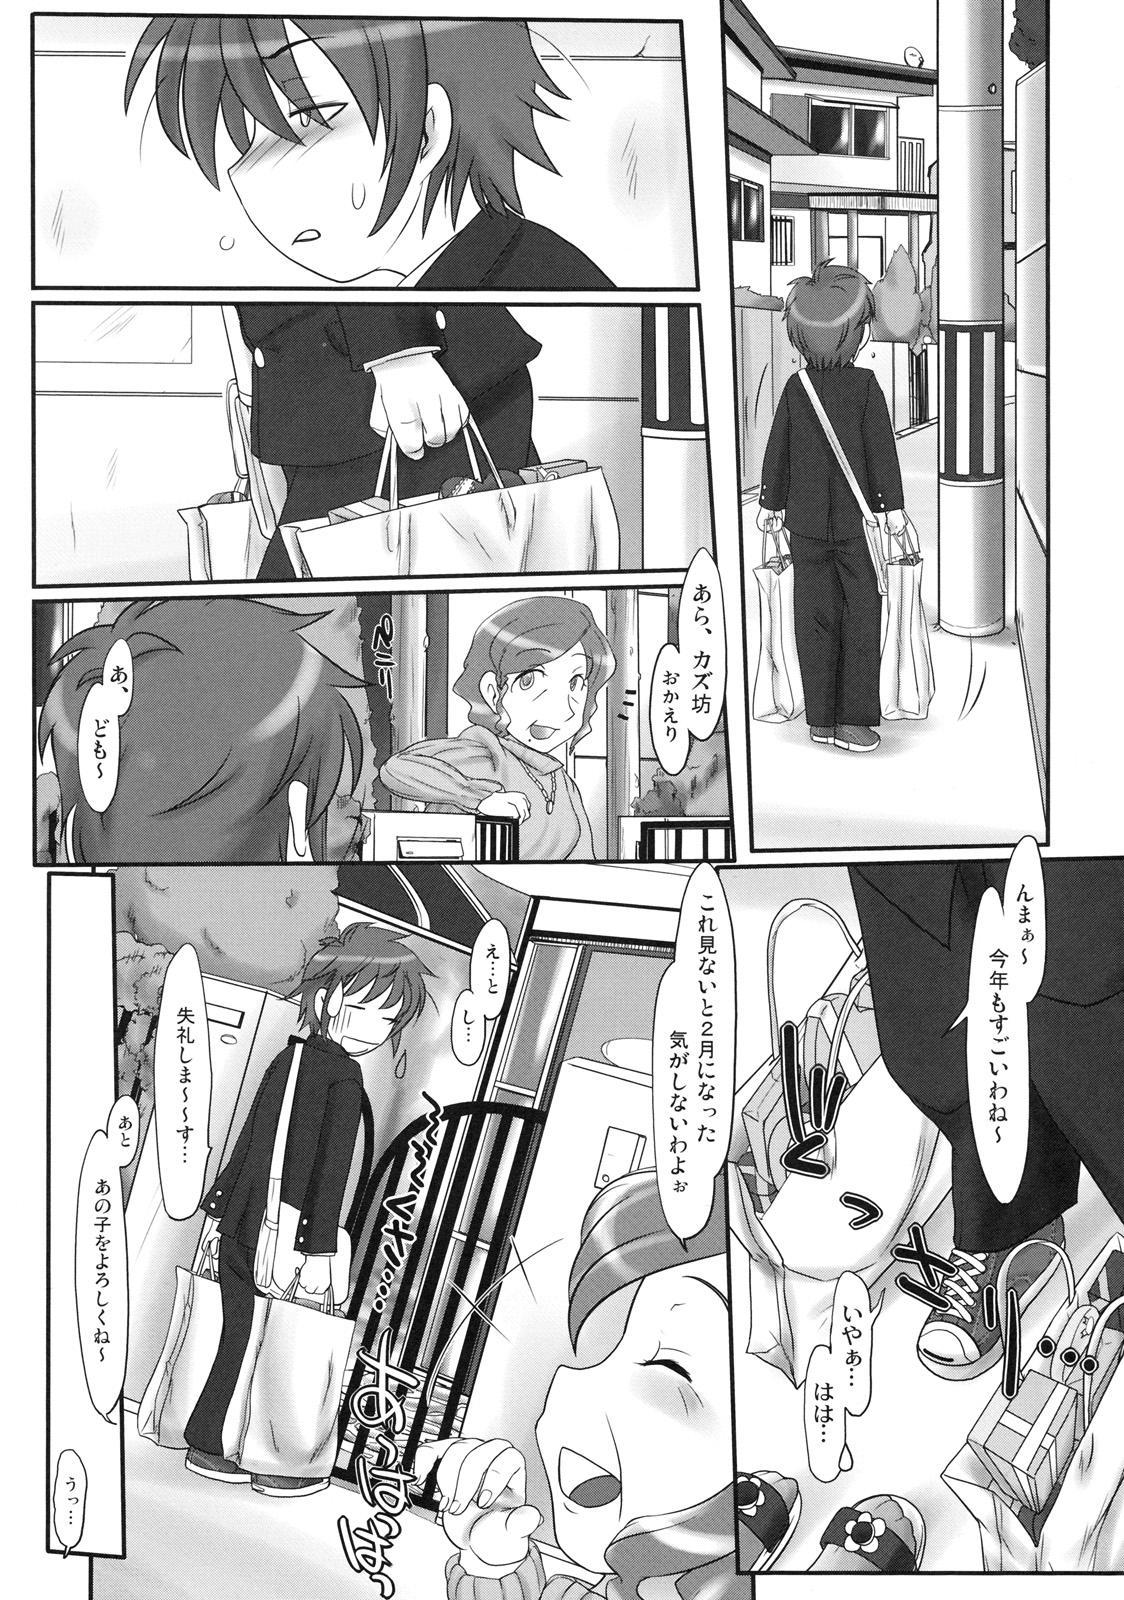 Shinzui Valentine Special Vol. 1 43